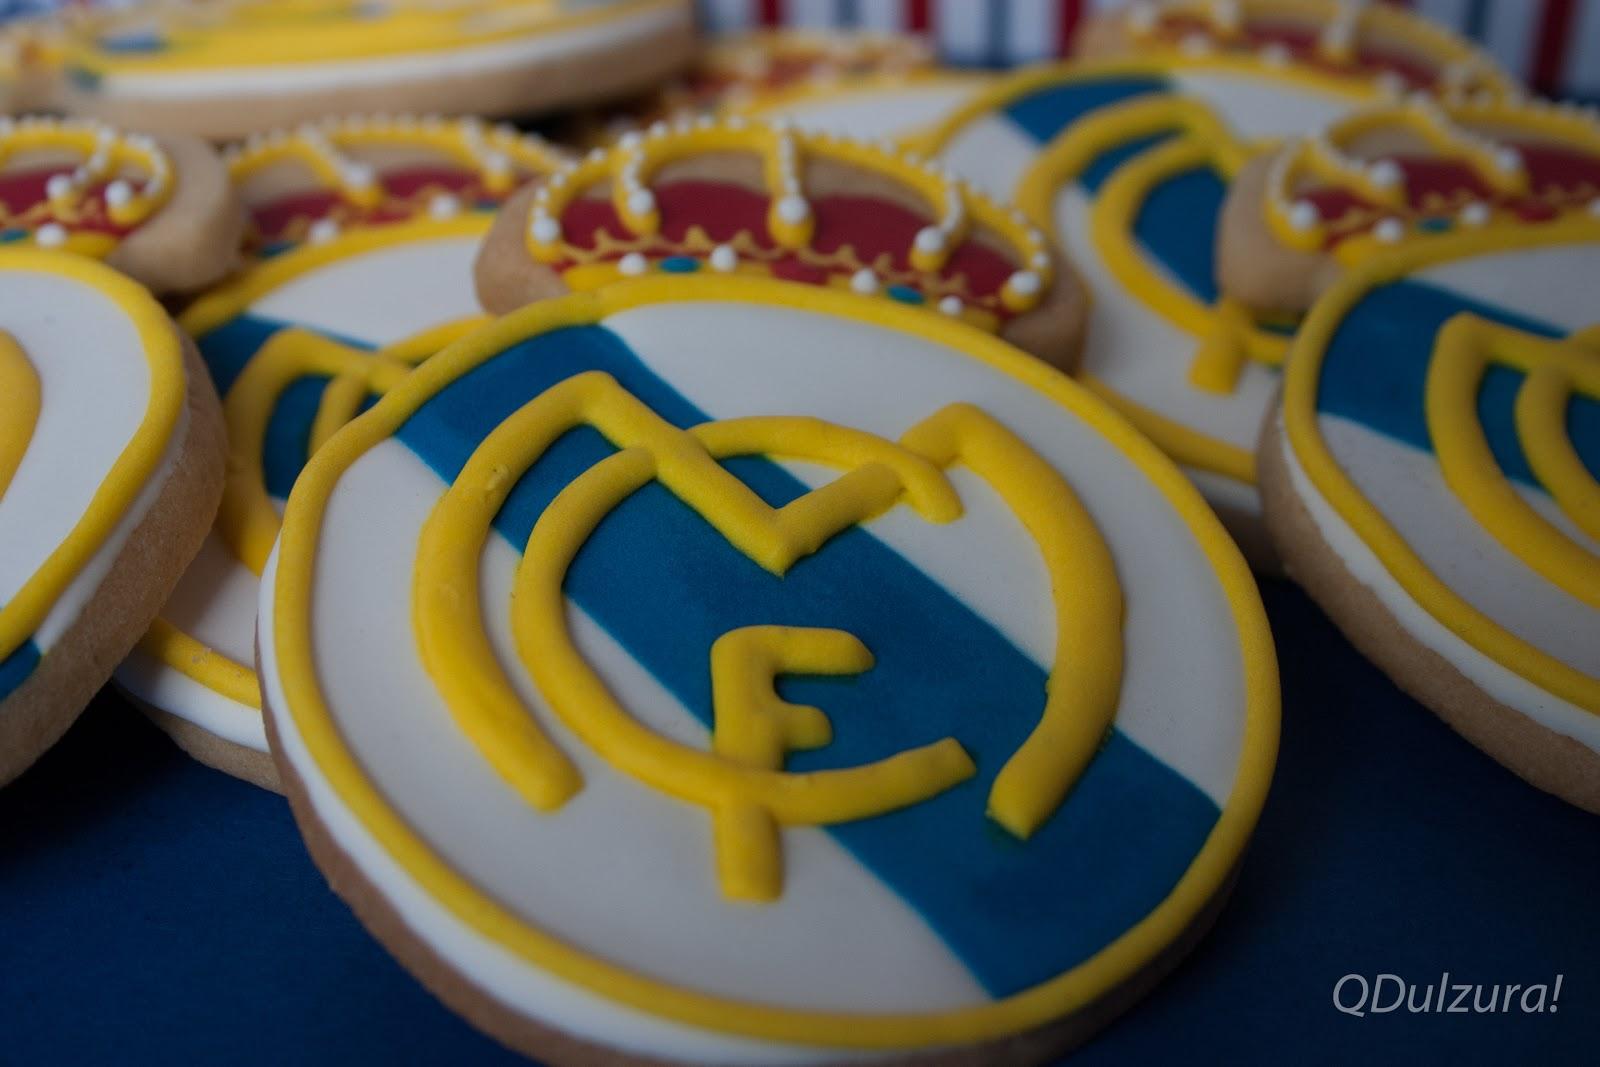 Qdulzura Hala Madrid